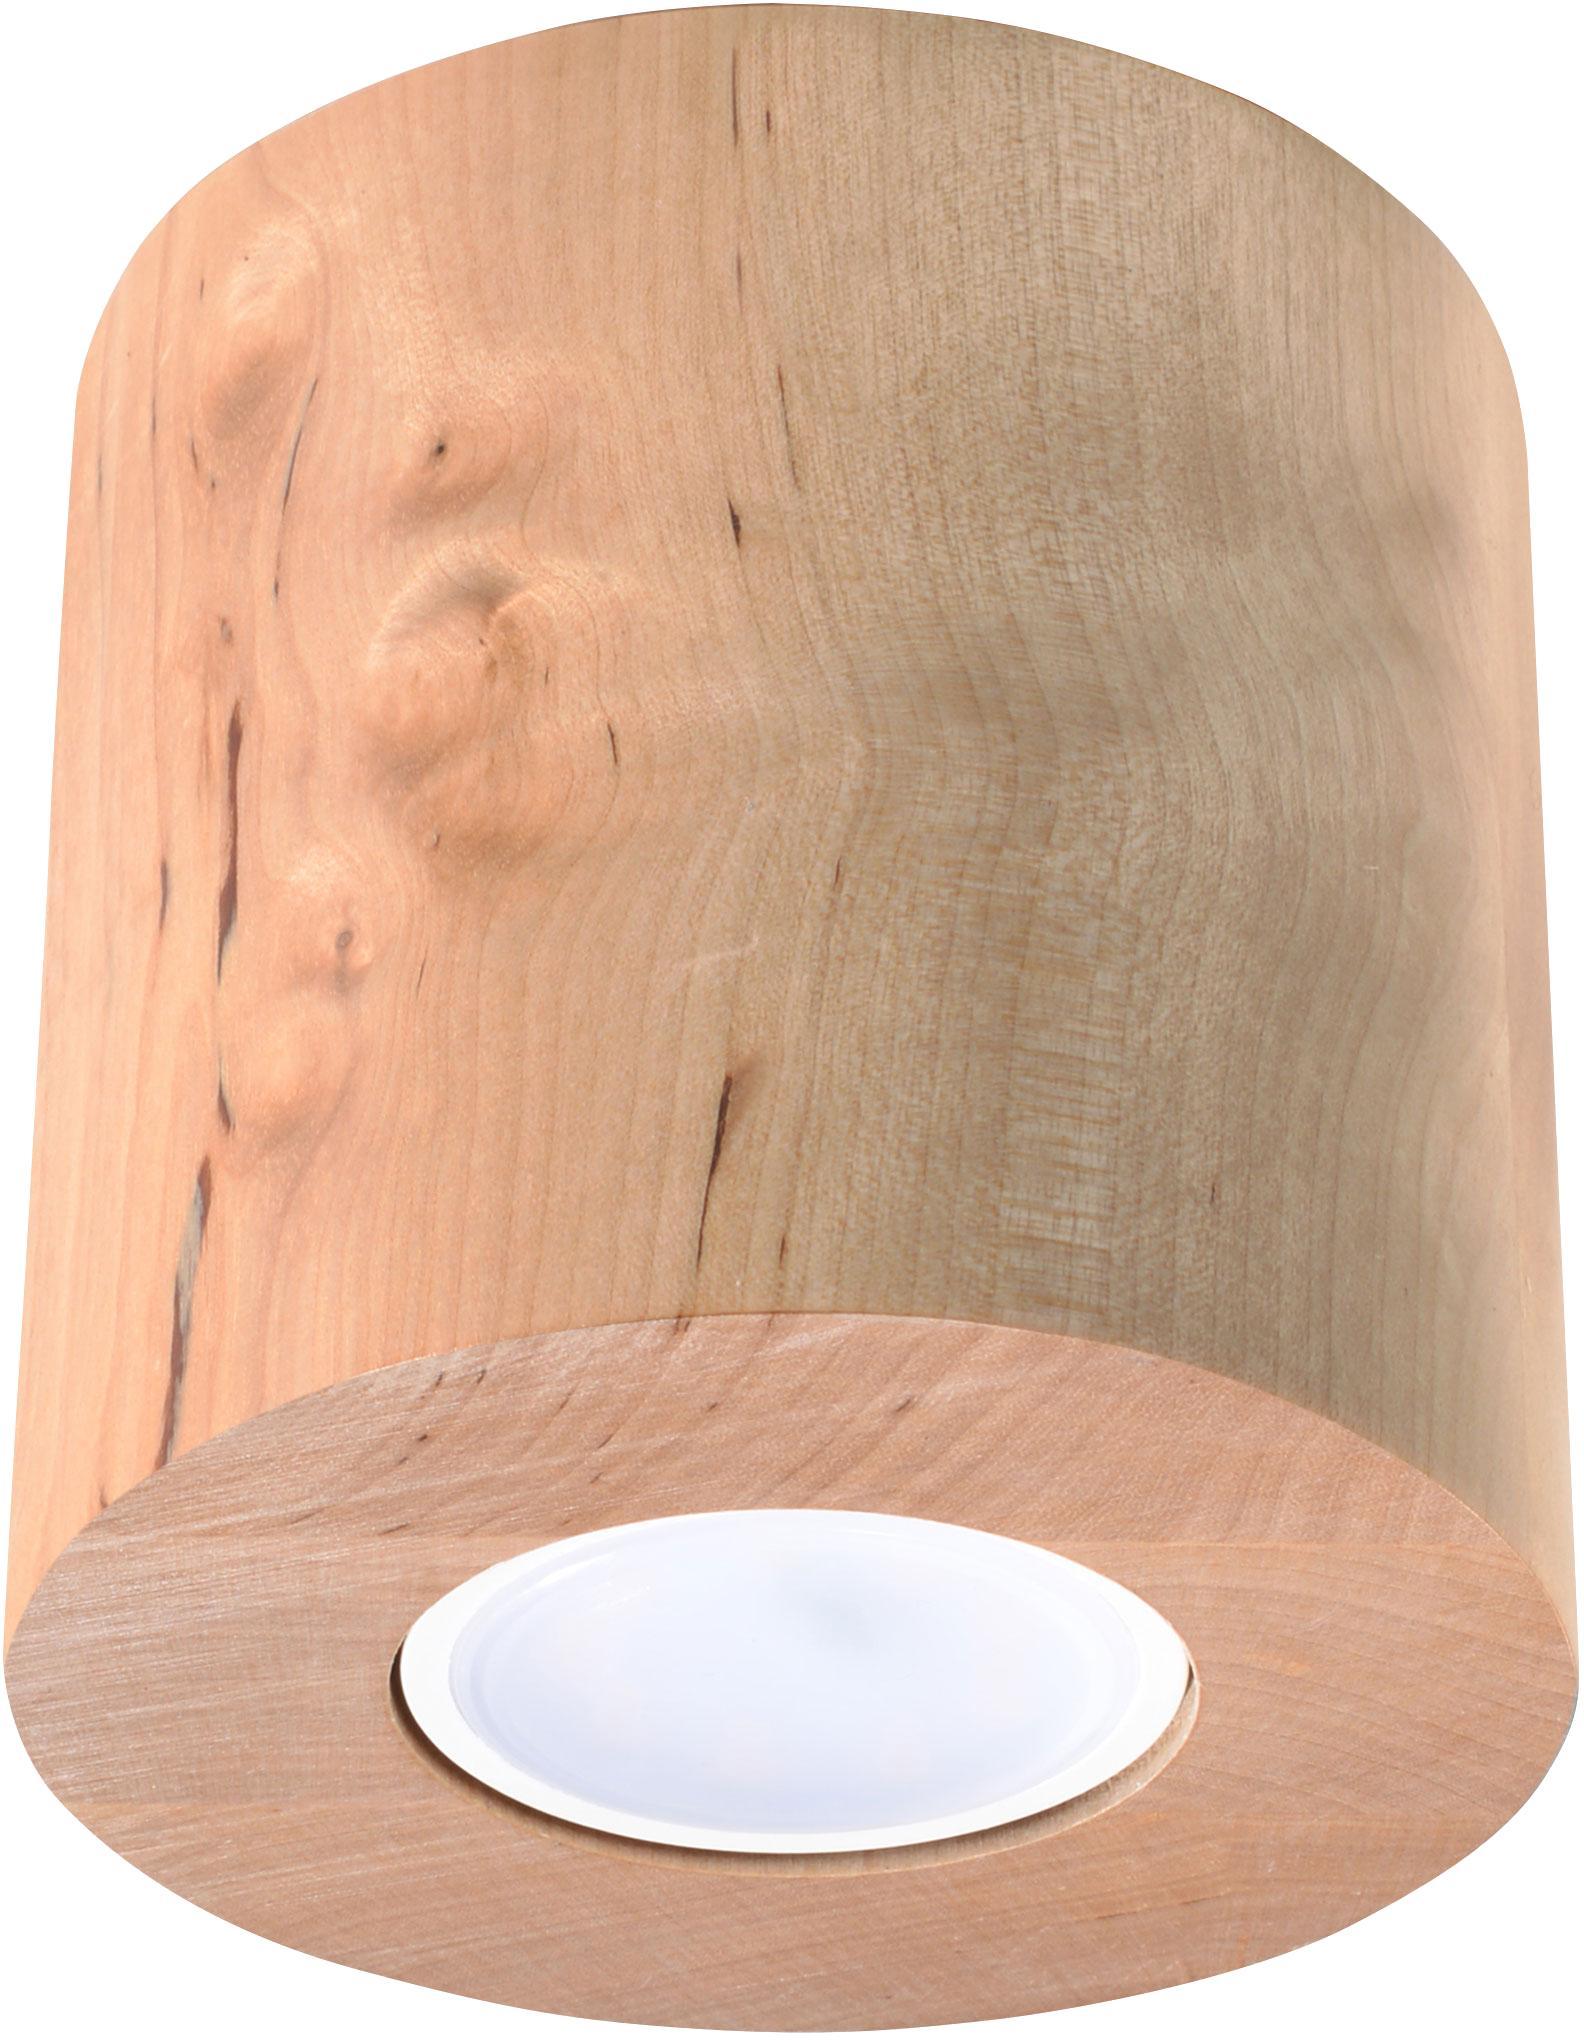 Plafondlamp Roda van hout, Diffuser: kunststof, Lichtbruin, Ø 10 x H 12 cm